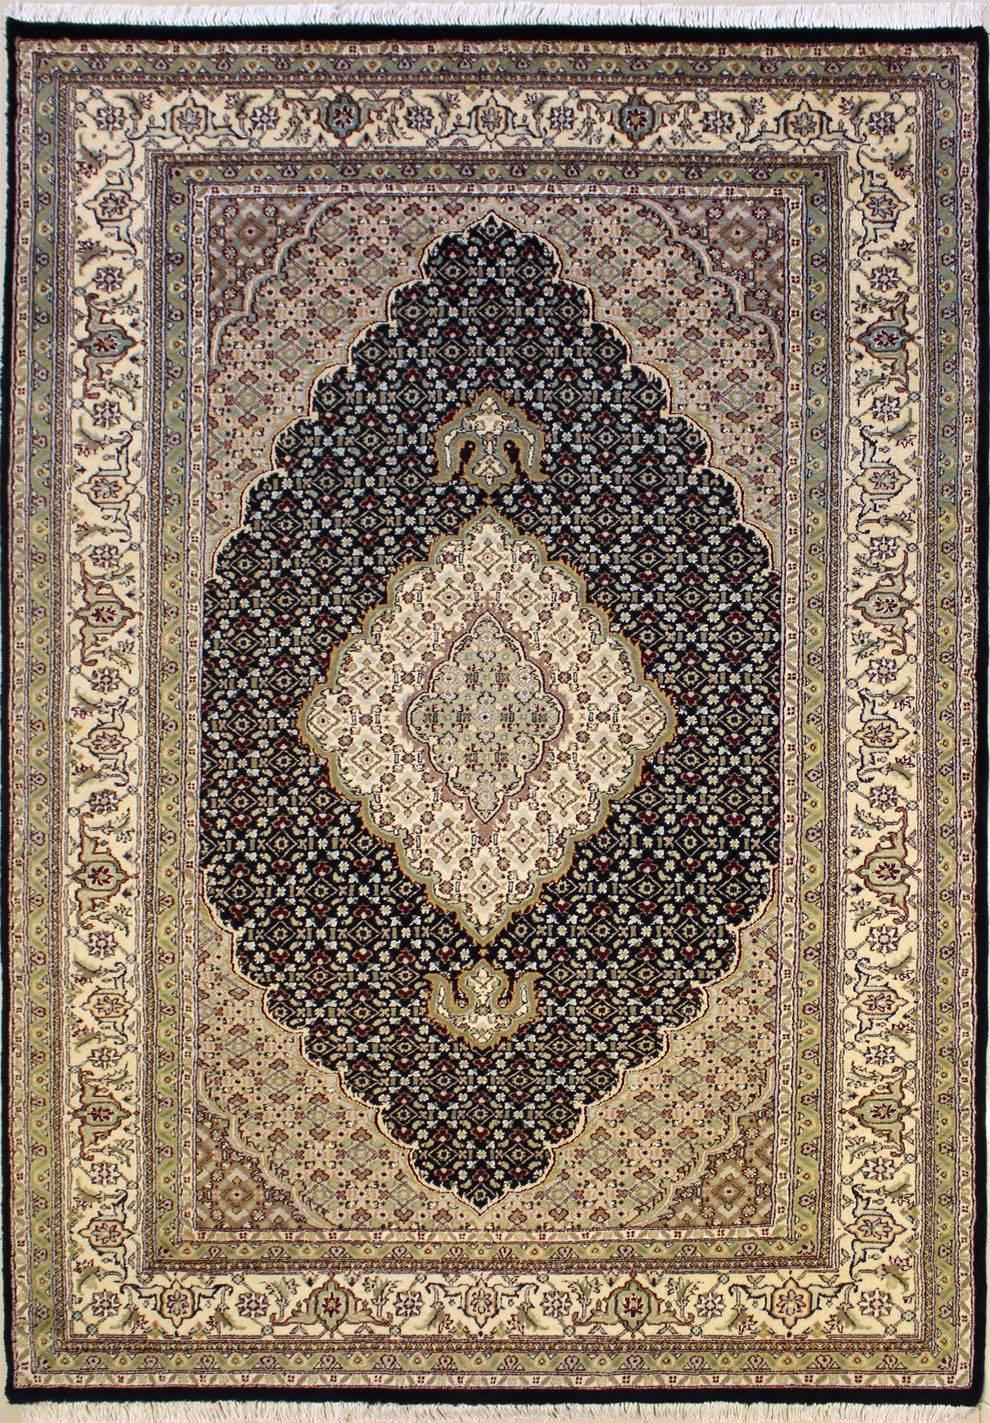 5 39 11x8 39 11 Rug Floral Handmade Pak Persian High Quality